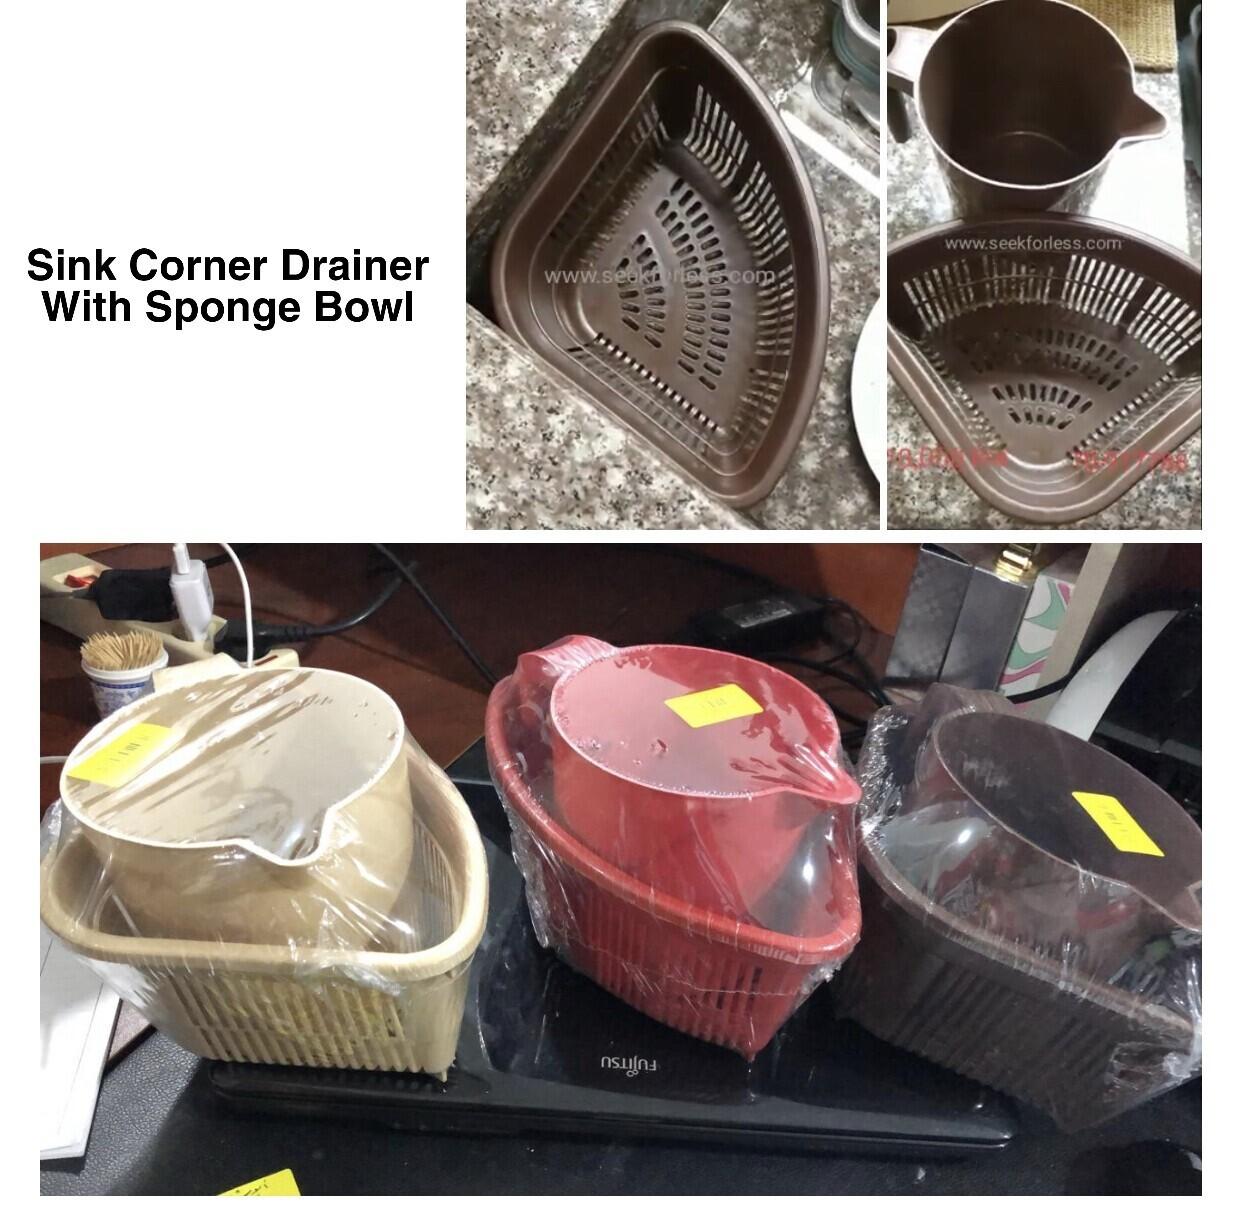 Sink Drainer & Bowl